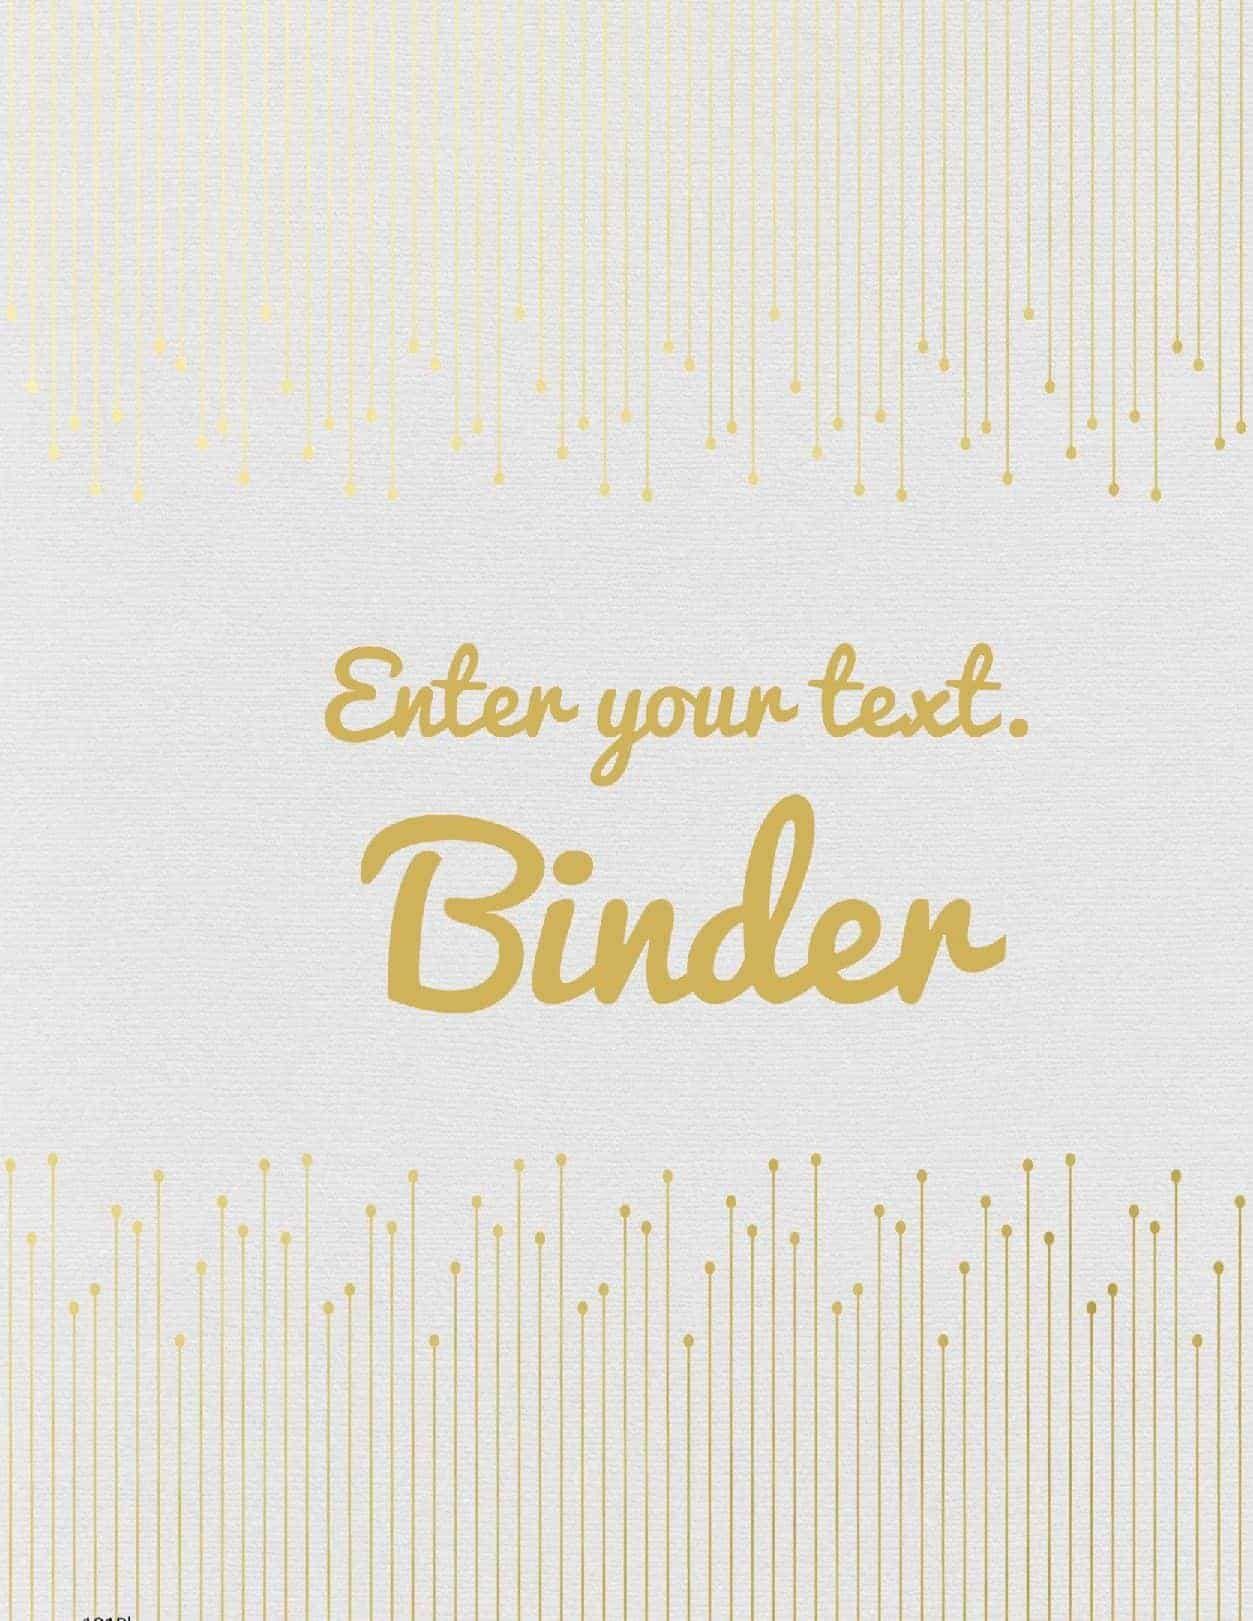 Free Printable Binder Cover Templates Customize Online Print At Home Binder Cover Templates Binder Covers Printable Binder Covers